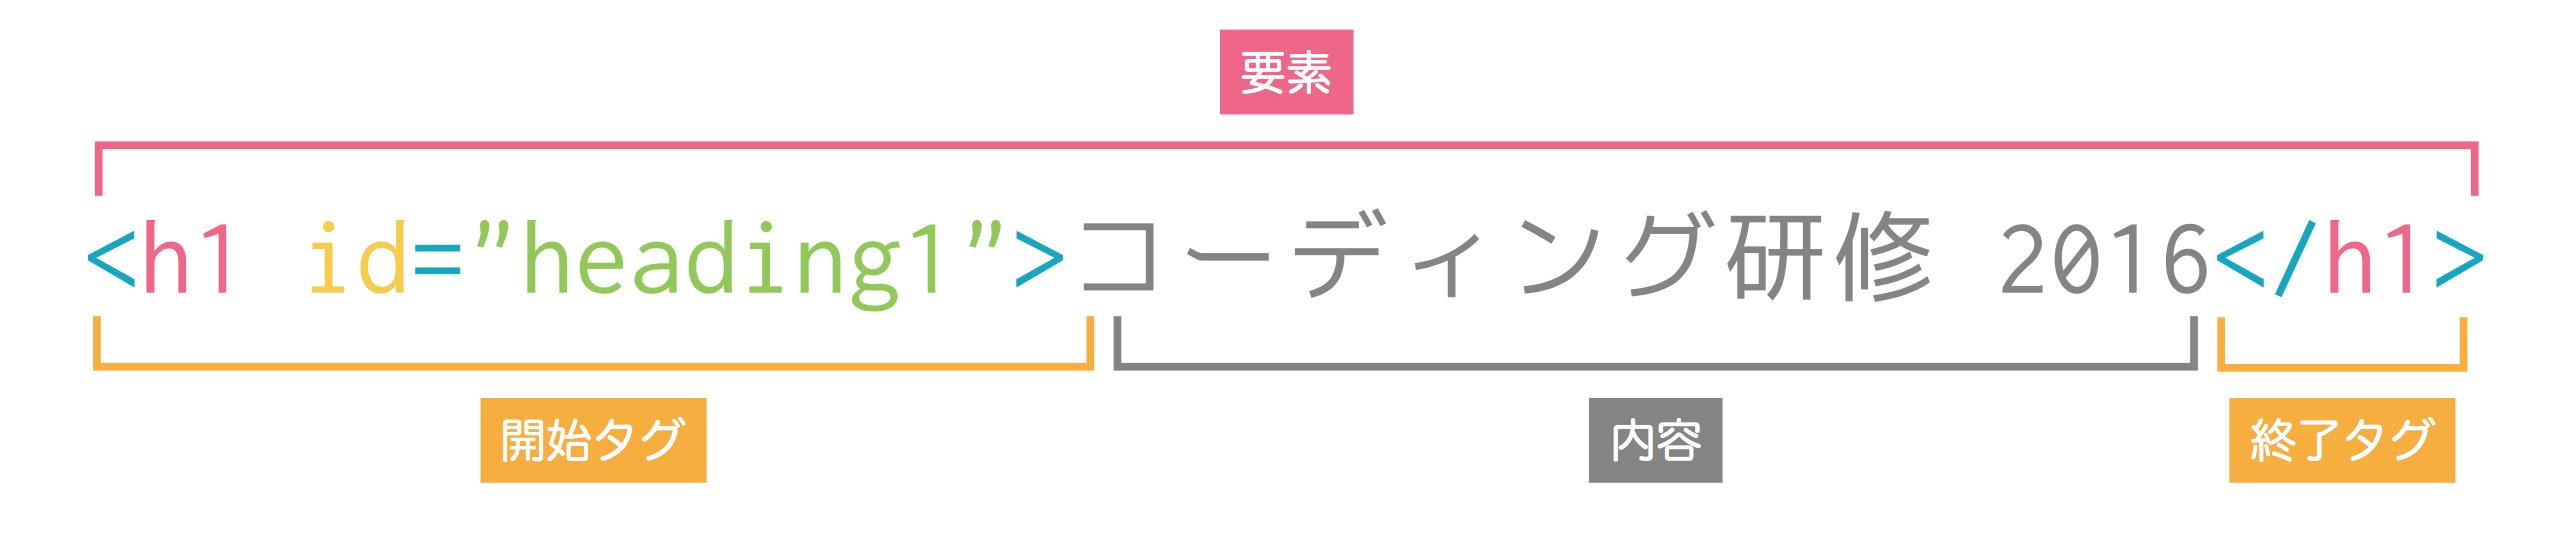 image_html_b.png